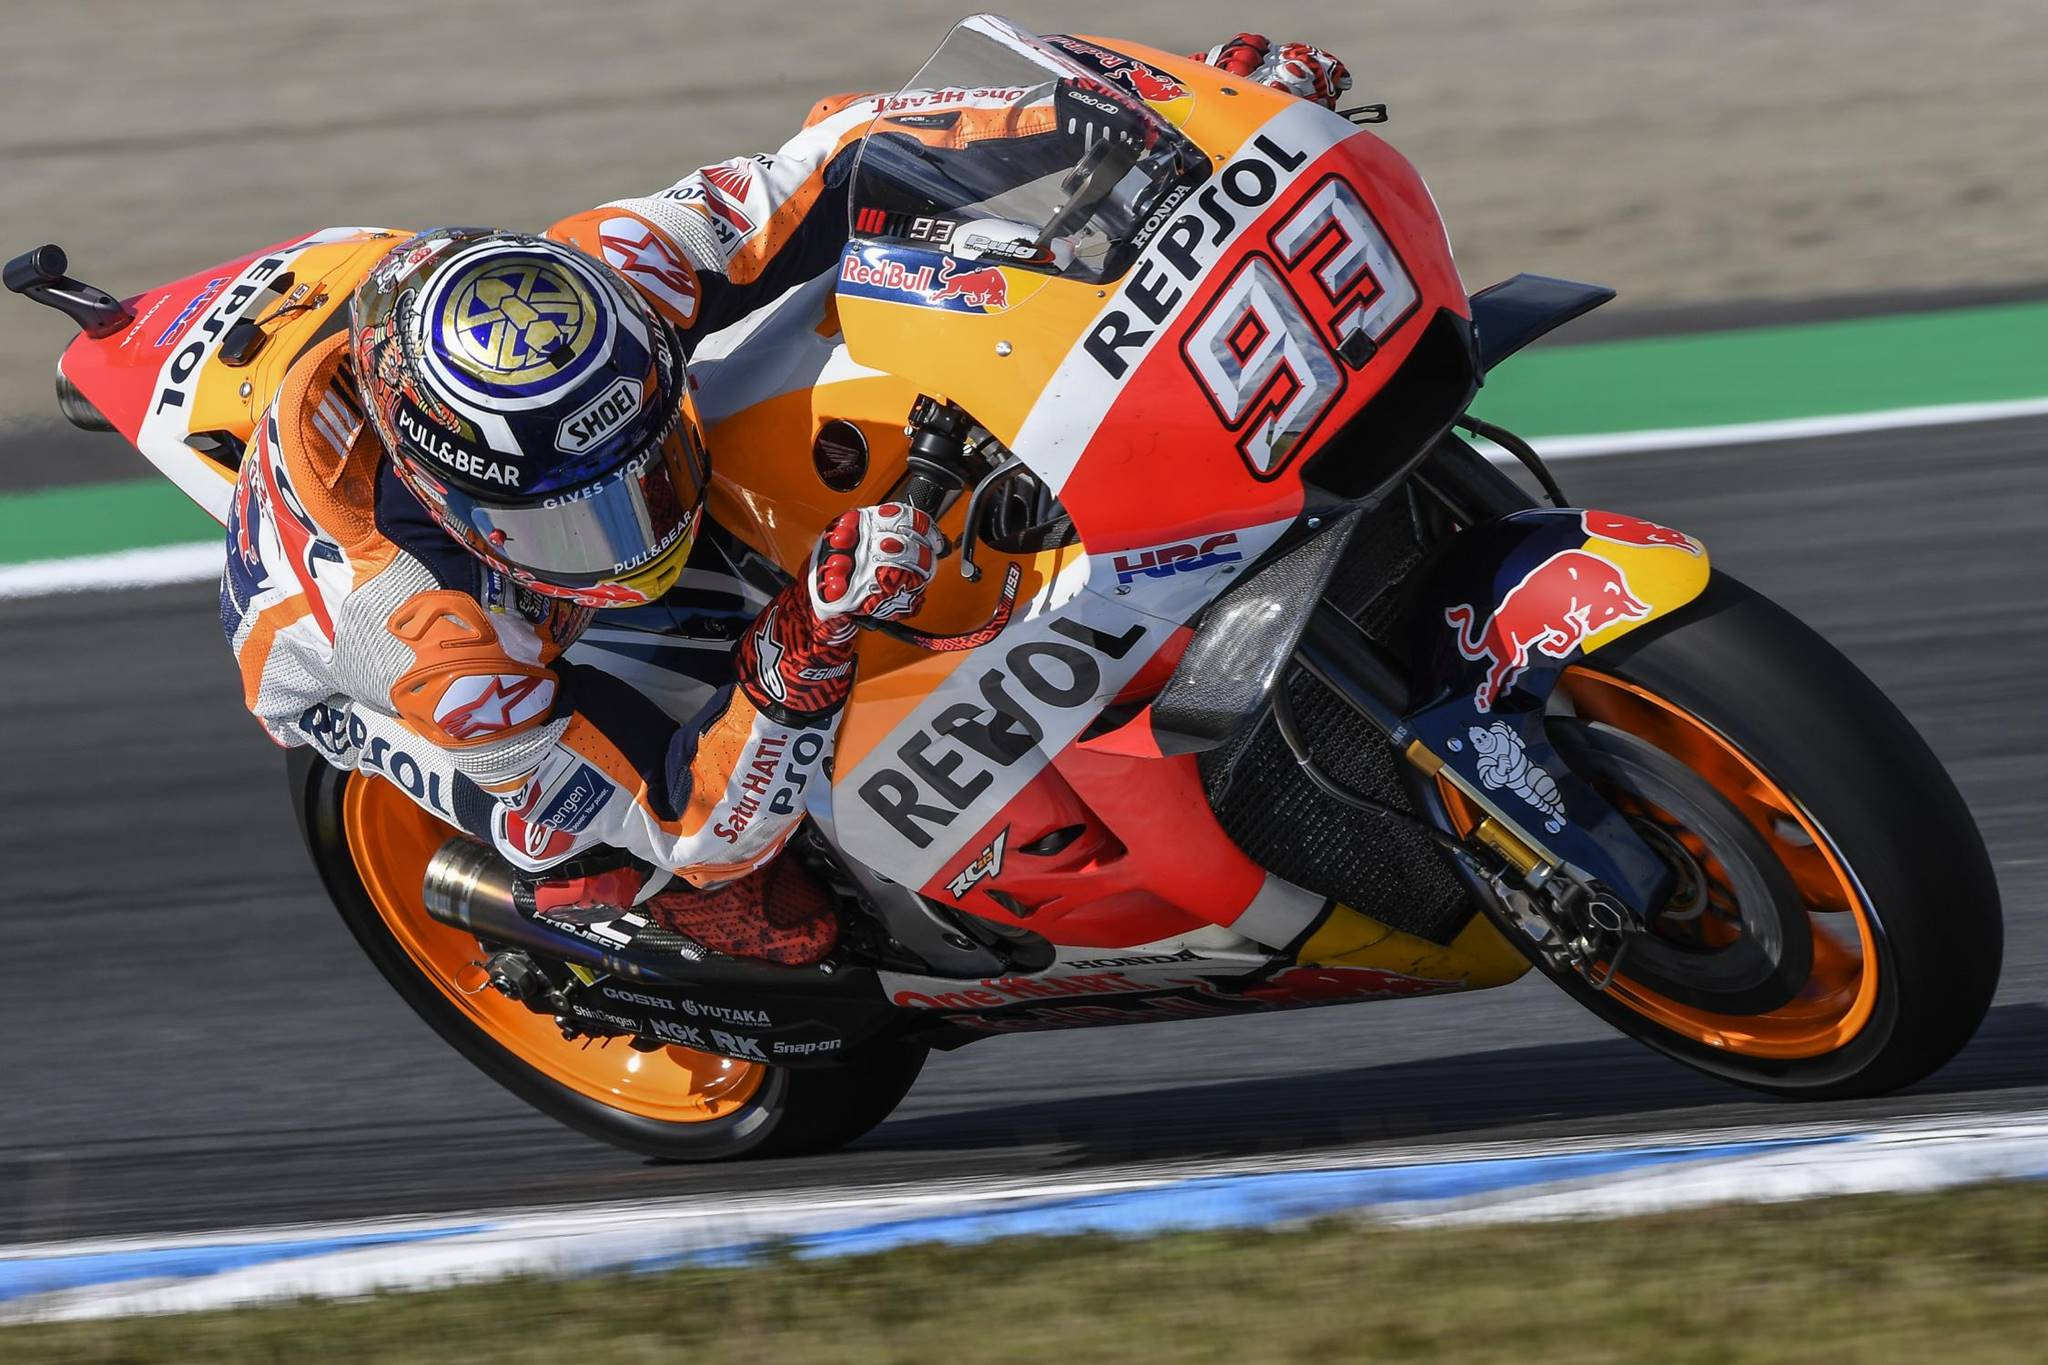 MotoGP_2018_JapaneseGP_Xe_Tinhte_003.jpg